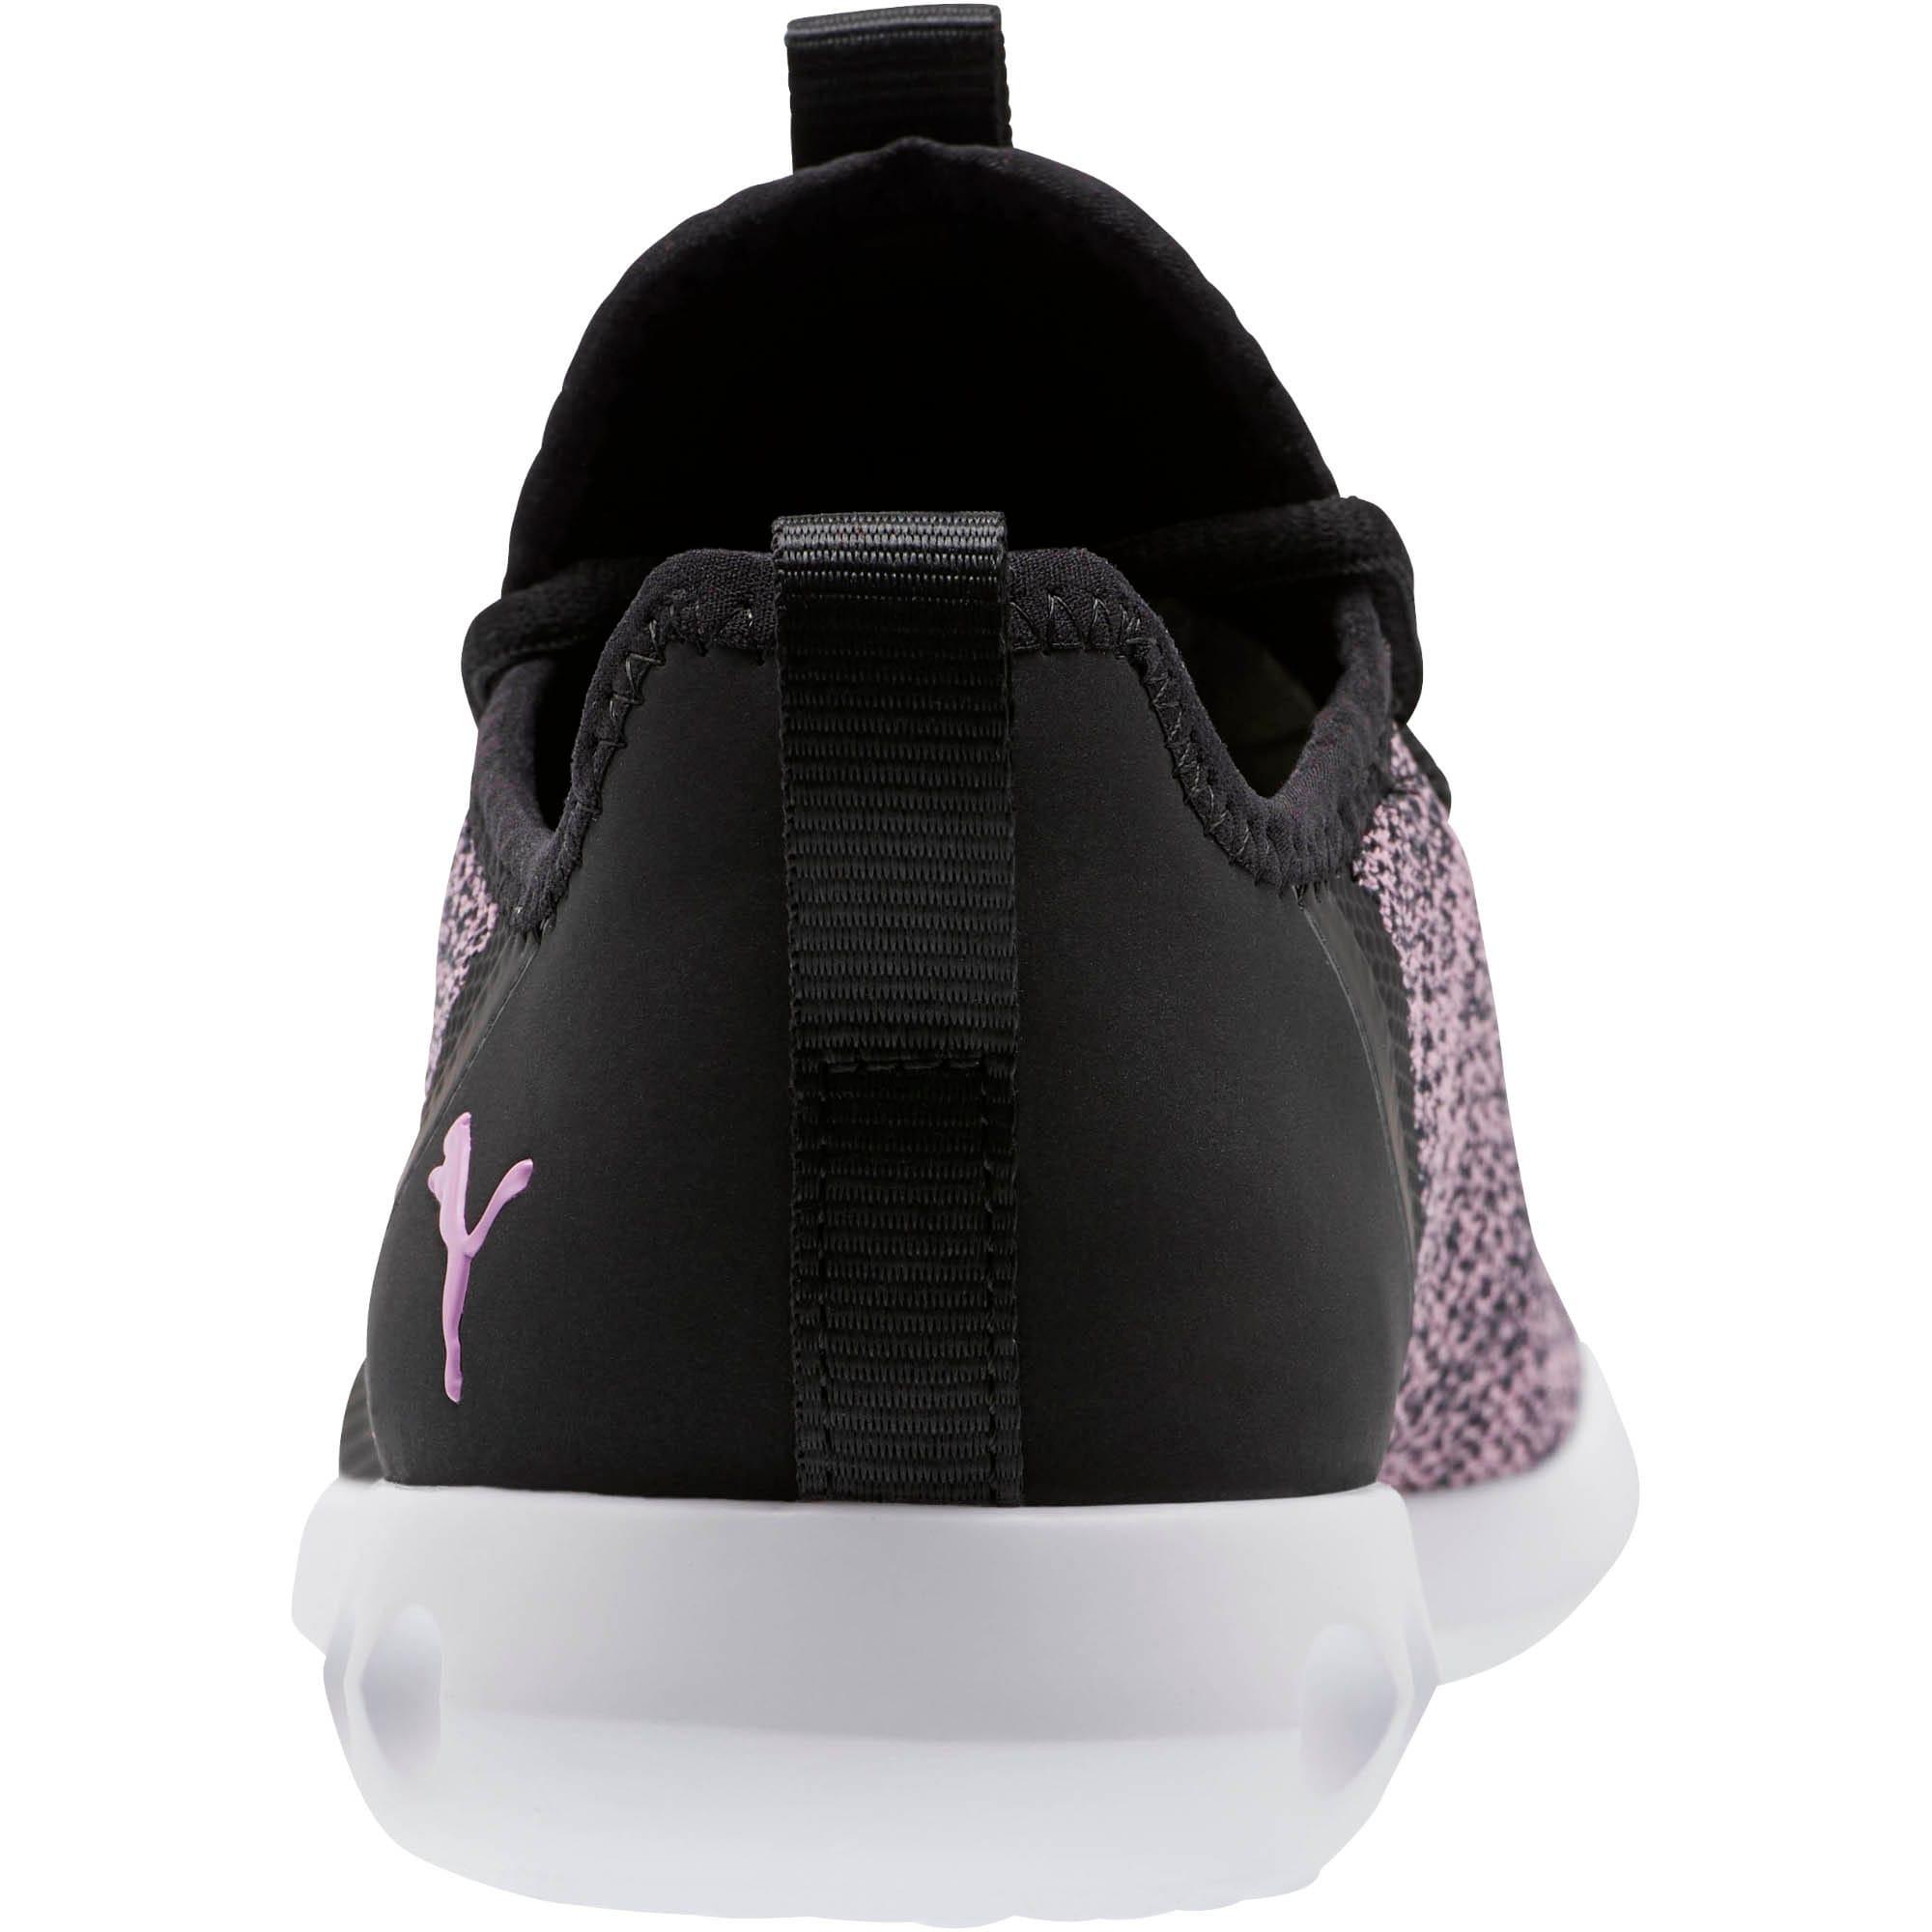 Thumbnail 3 of Carson 2 X Knit Women's Running Shoes, Puma Black-Orchid, medium